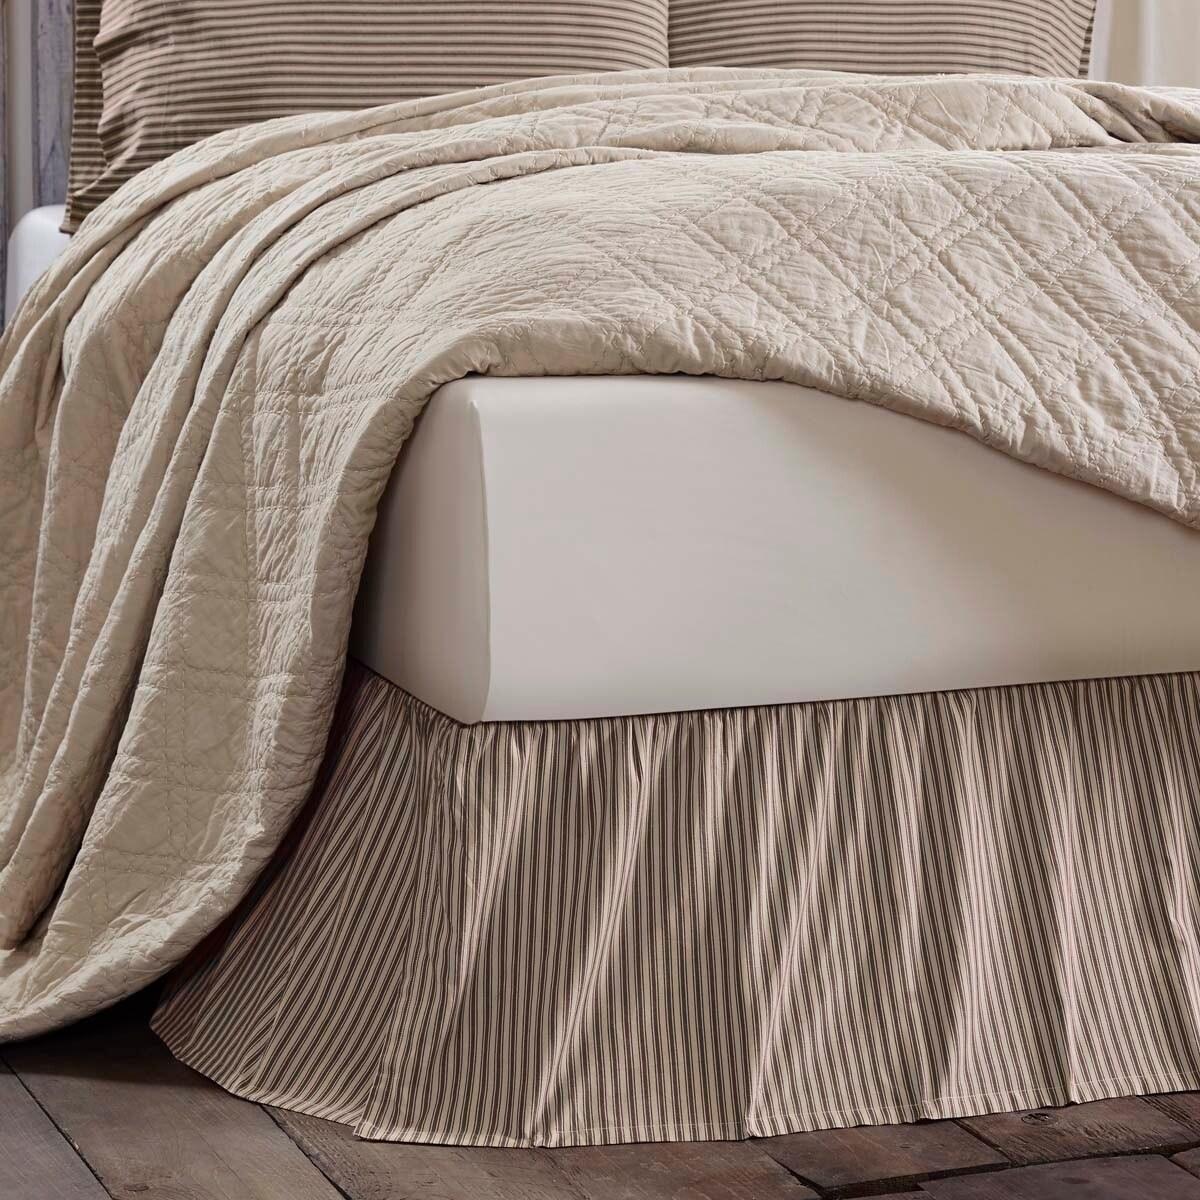 VHC Farmhouse Bed Skirt Sawyer Mill Ticking Stripe Bedding Cotton Striped